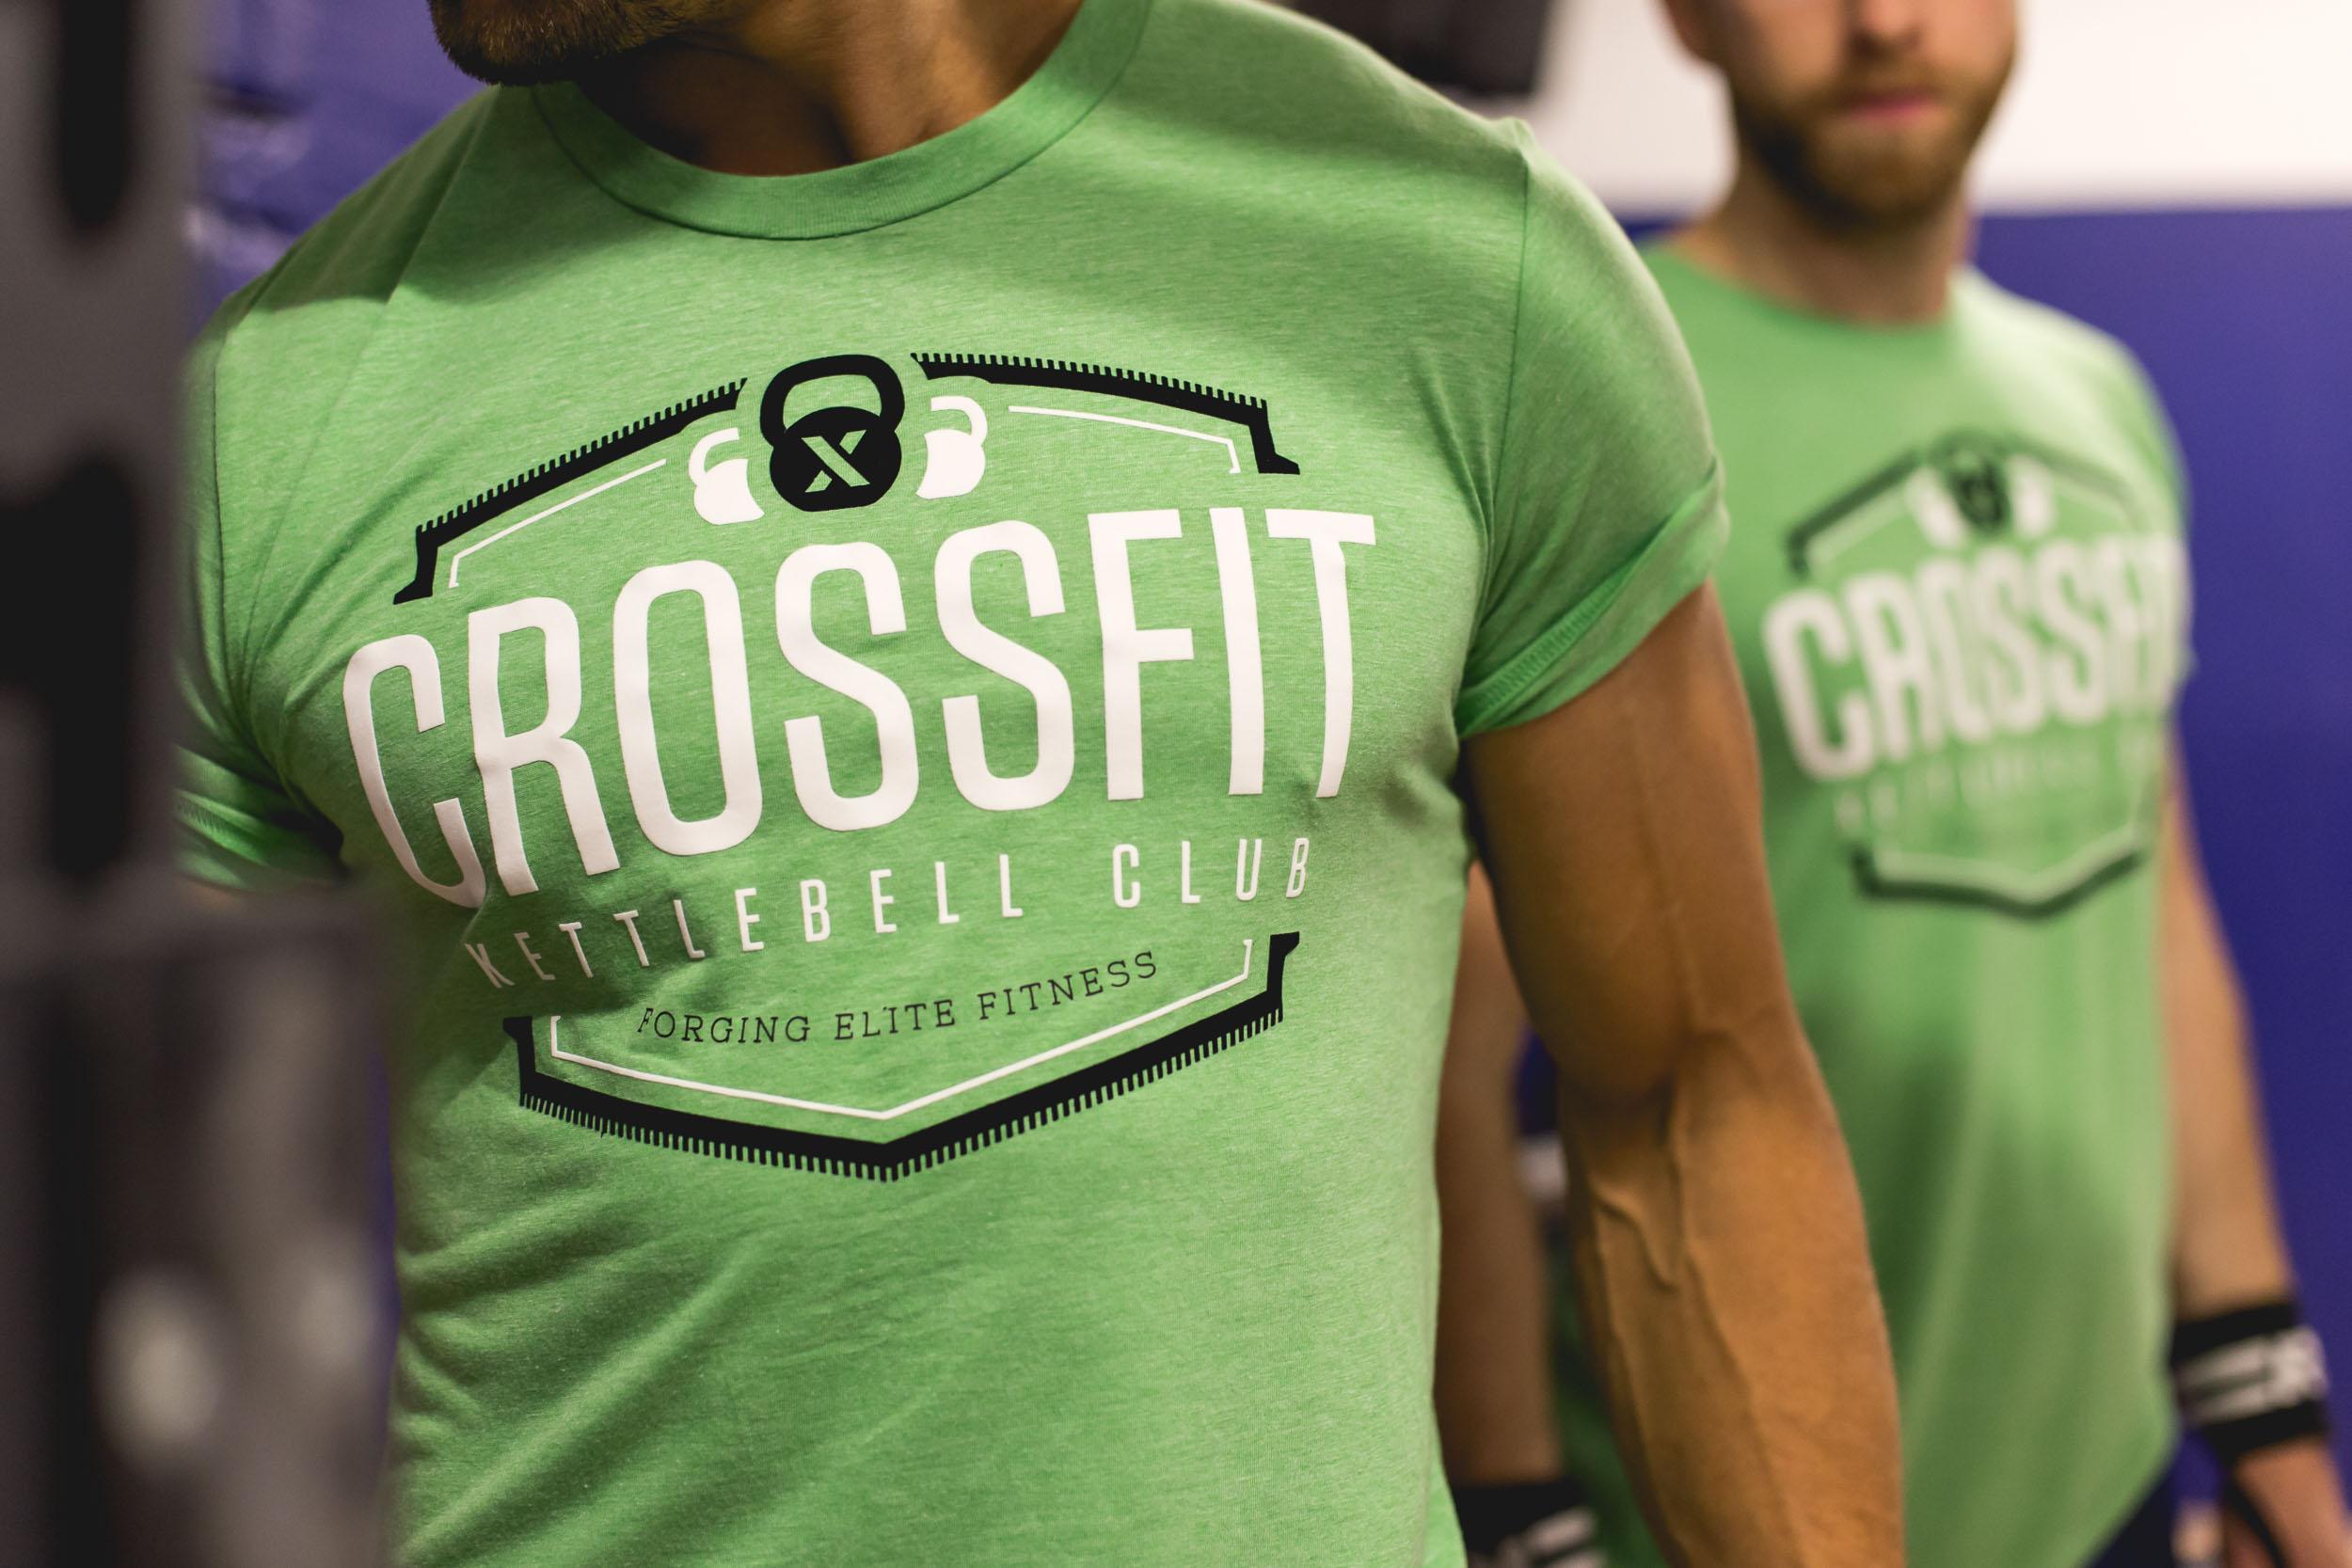 Crossfit UK printed clothing t-shirts-9384.jpg